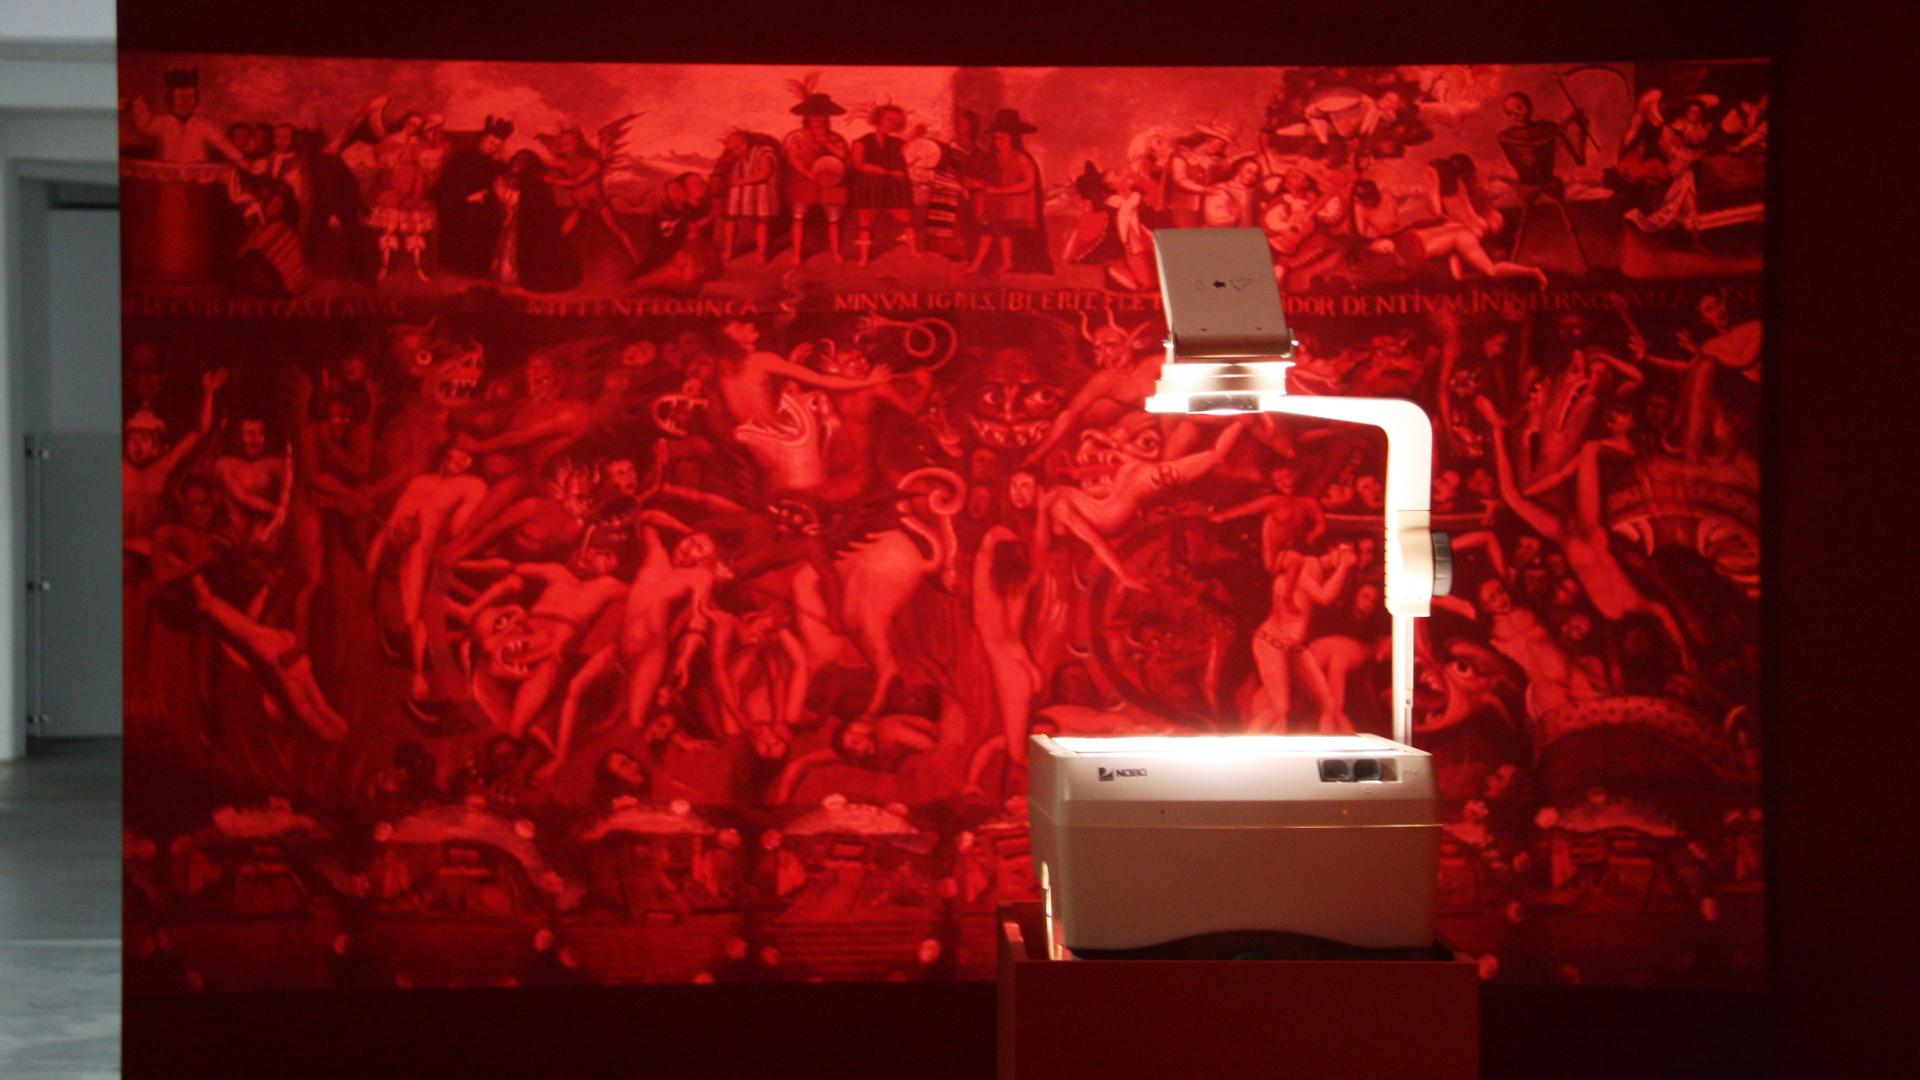 Installation view 1, Radio Carabuco, Andrés Pereira Paz, Künstlerhaus Bethanien| Radio Carabuco| Andrés Pereira Paz| STIR